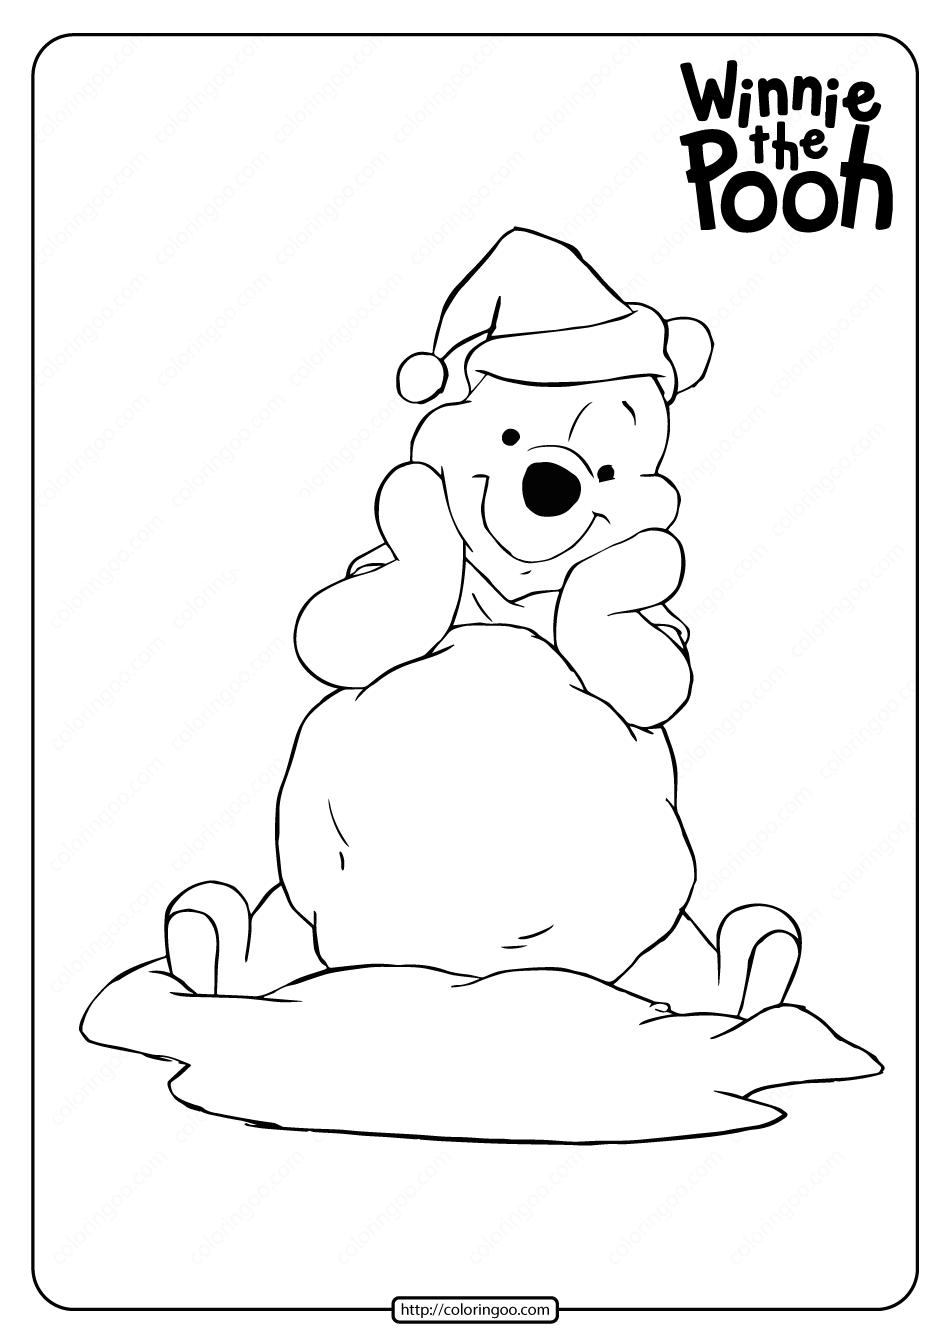 Printable Winnie the Pooh Santa Coloring Page